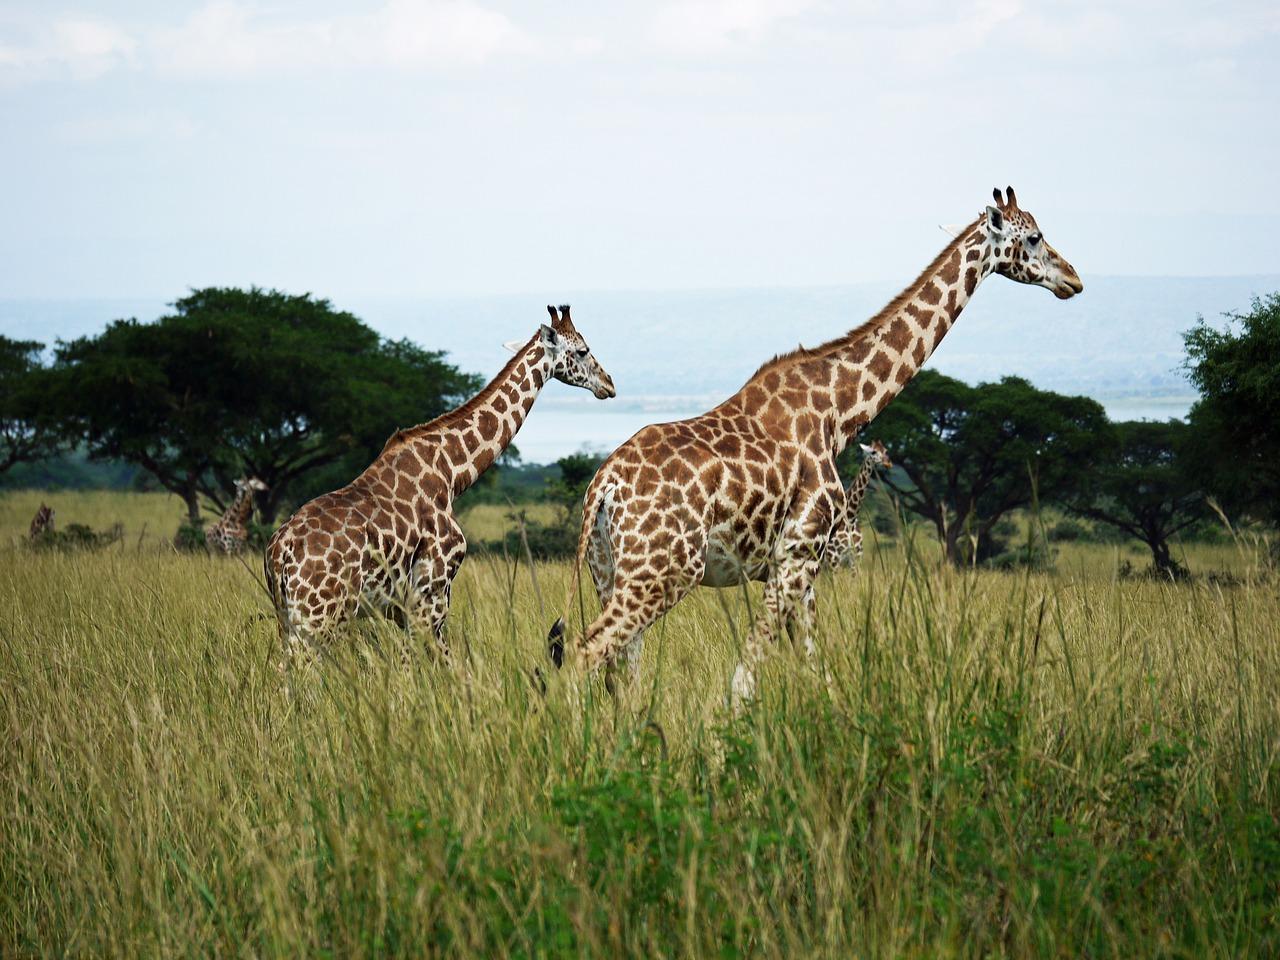 Giraffes in Uganda, Africa